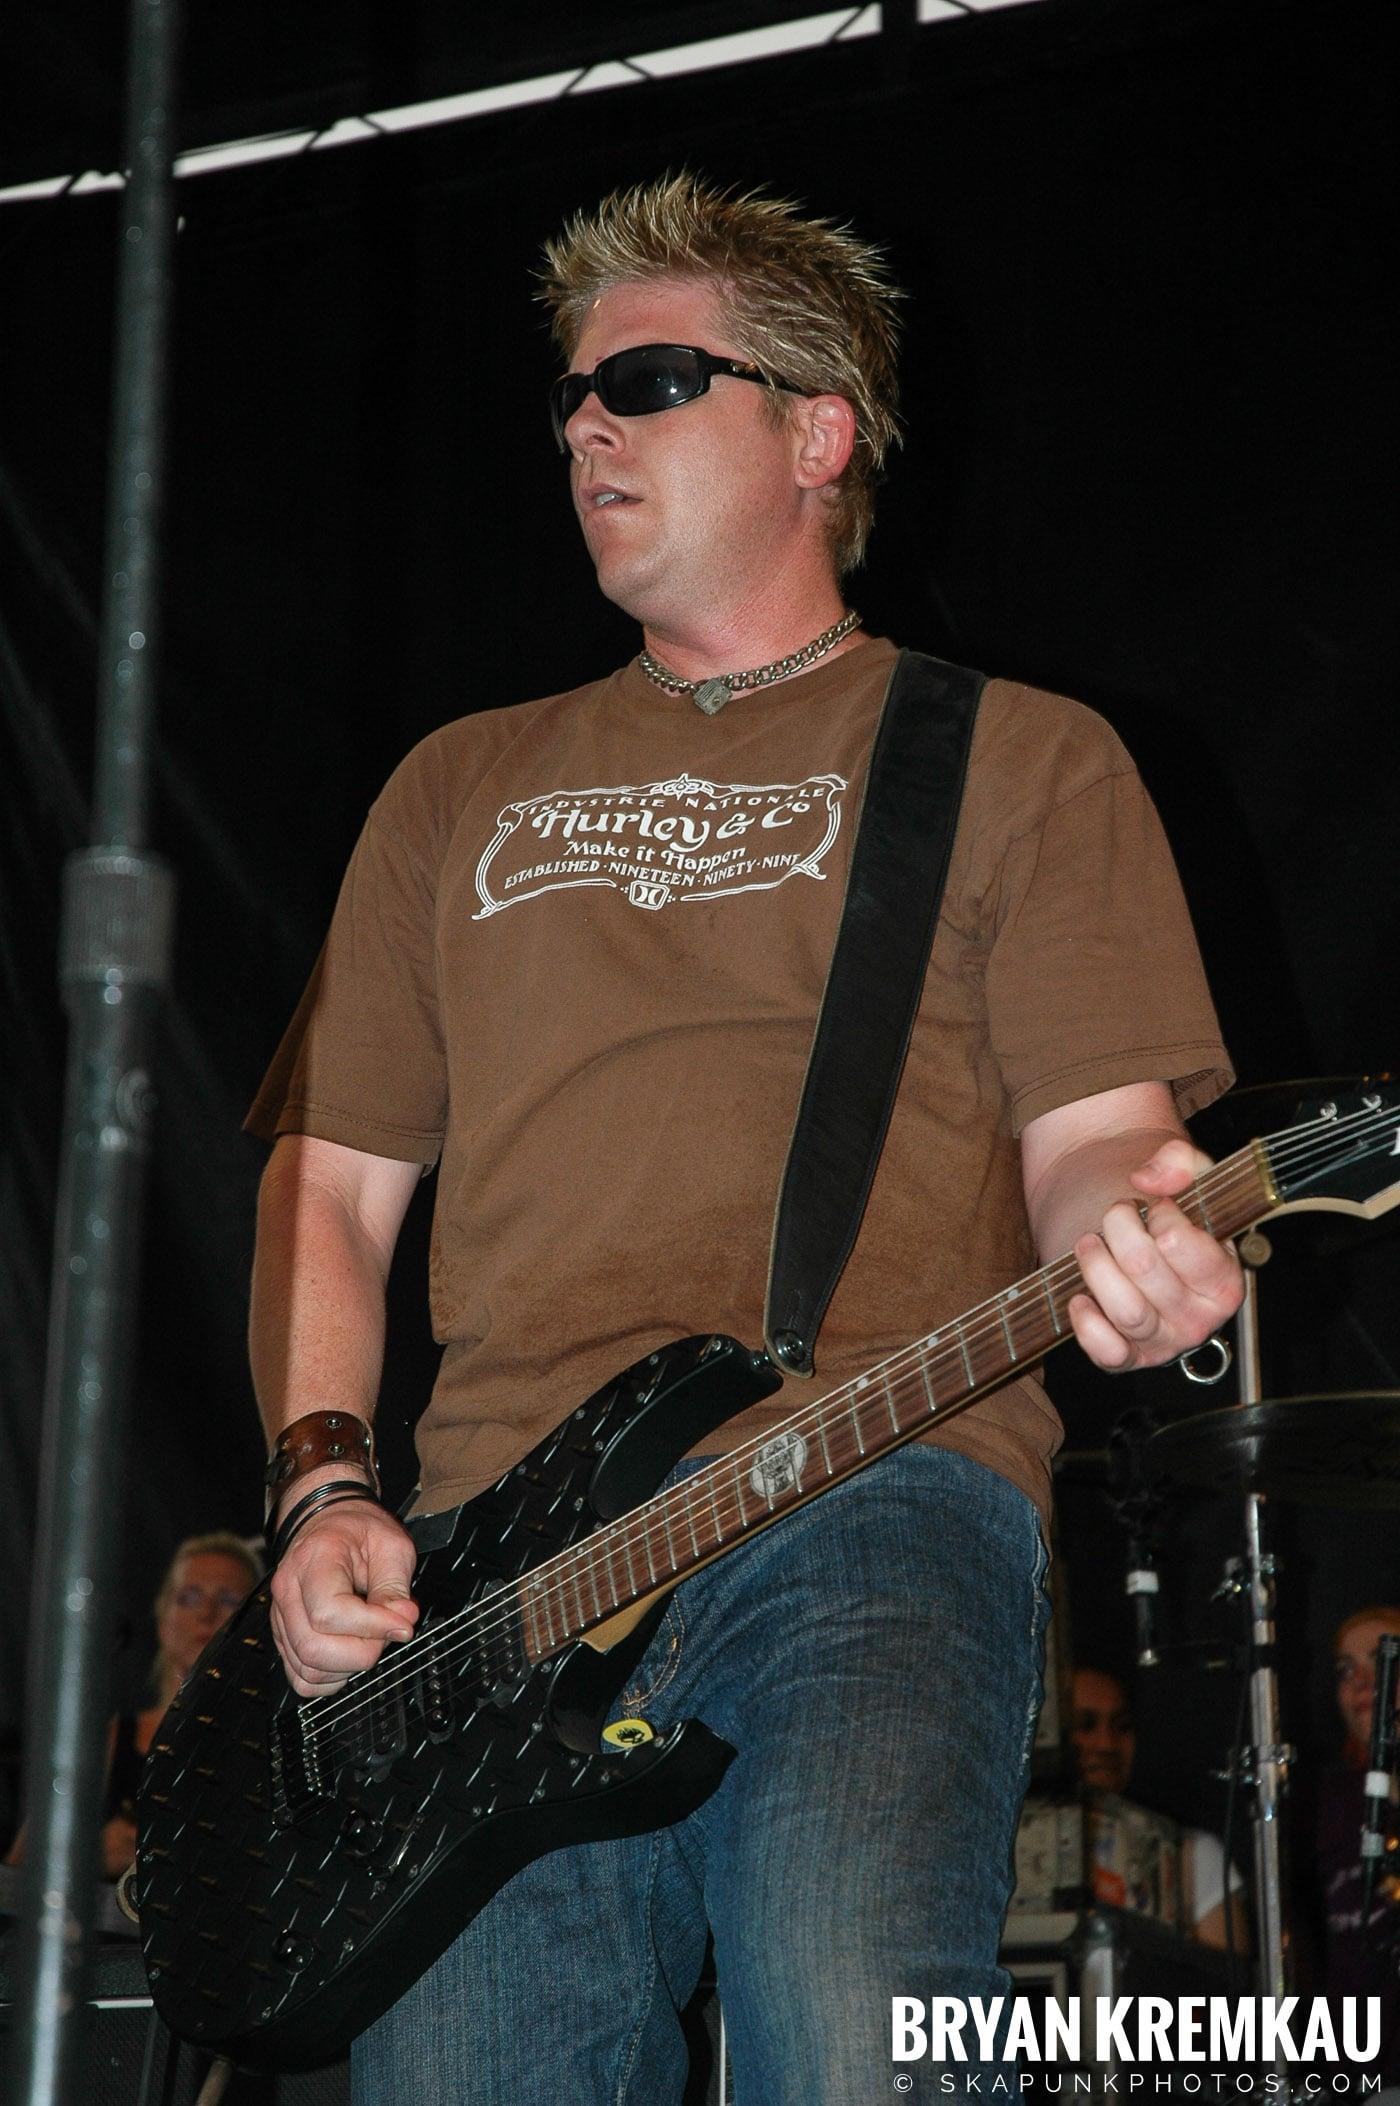 The Offspring @ Warped Tour 05, NYC - 8.12.05 (13)